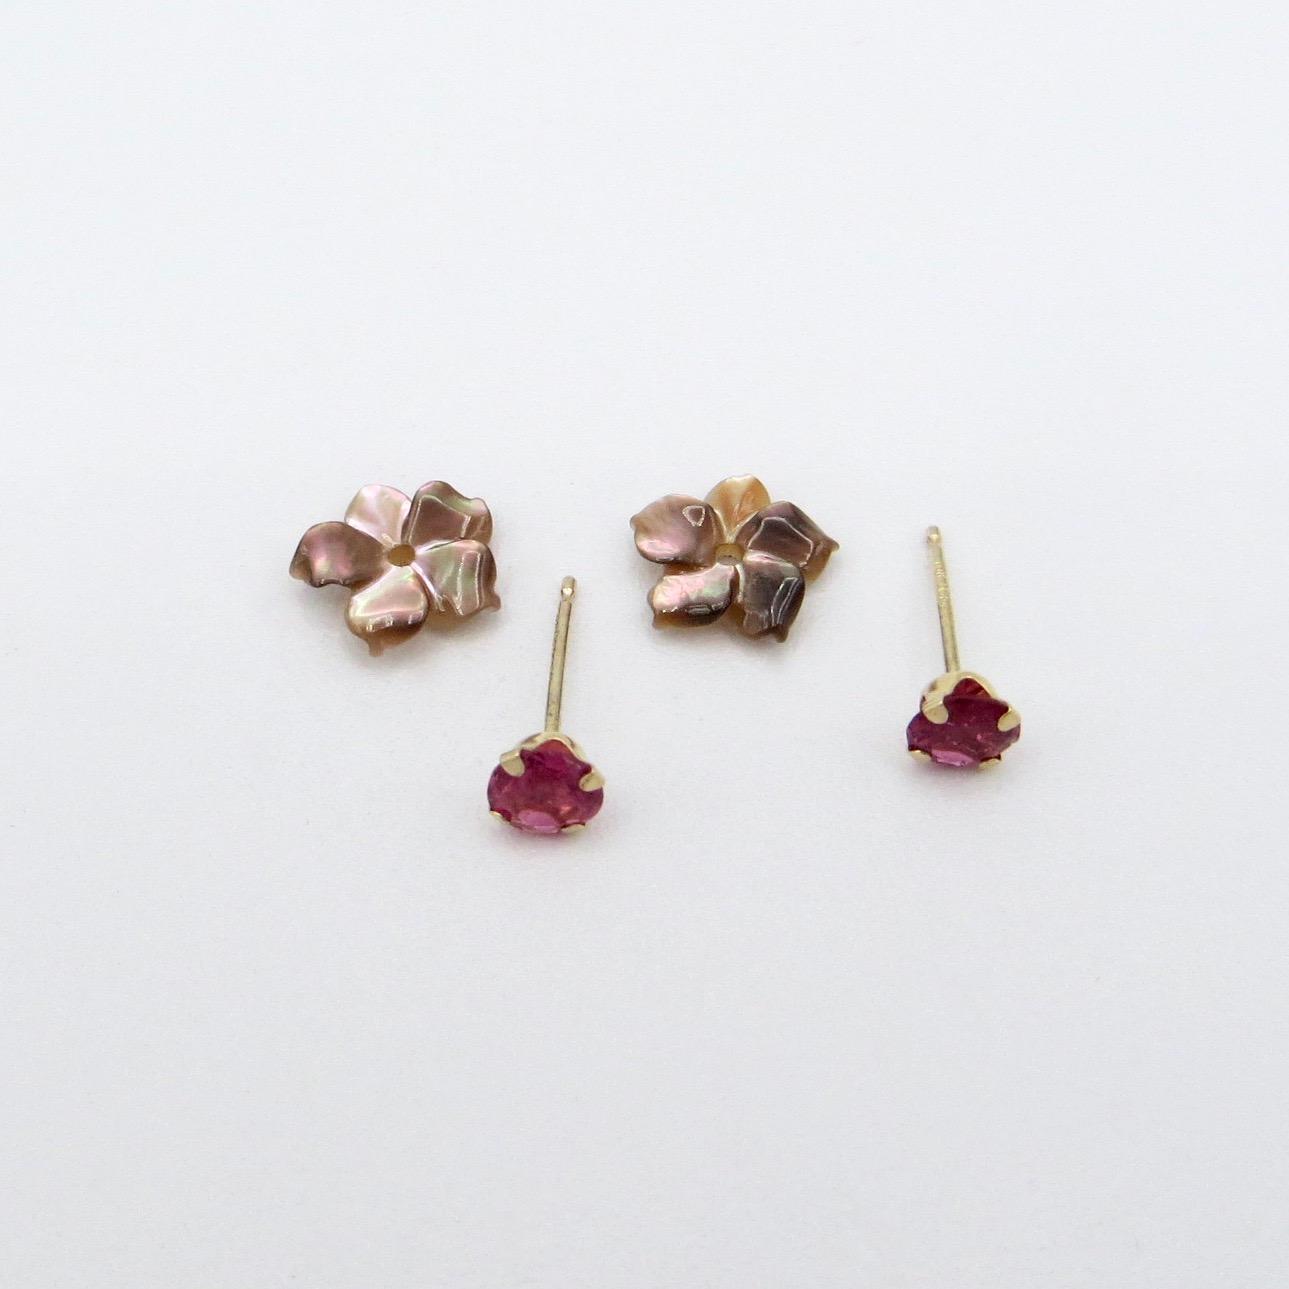 Gold & Tourmaline Earrings